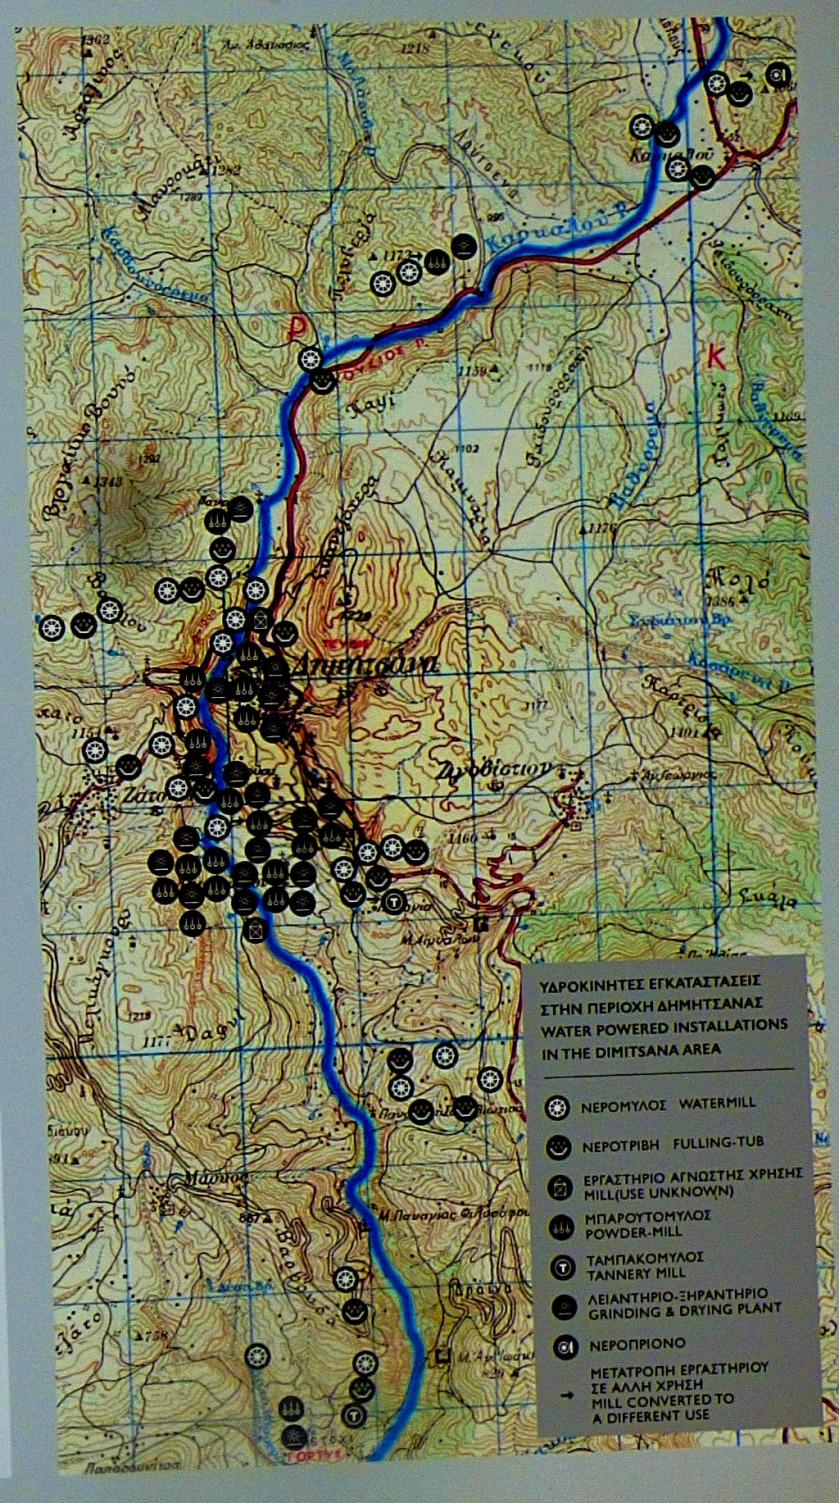 Water poweredinstallations in the Dimitsana area